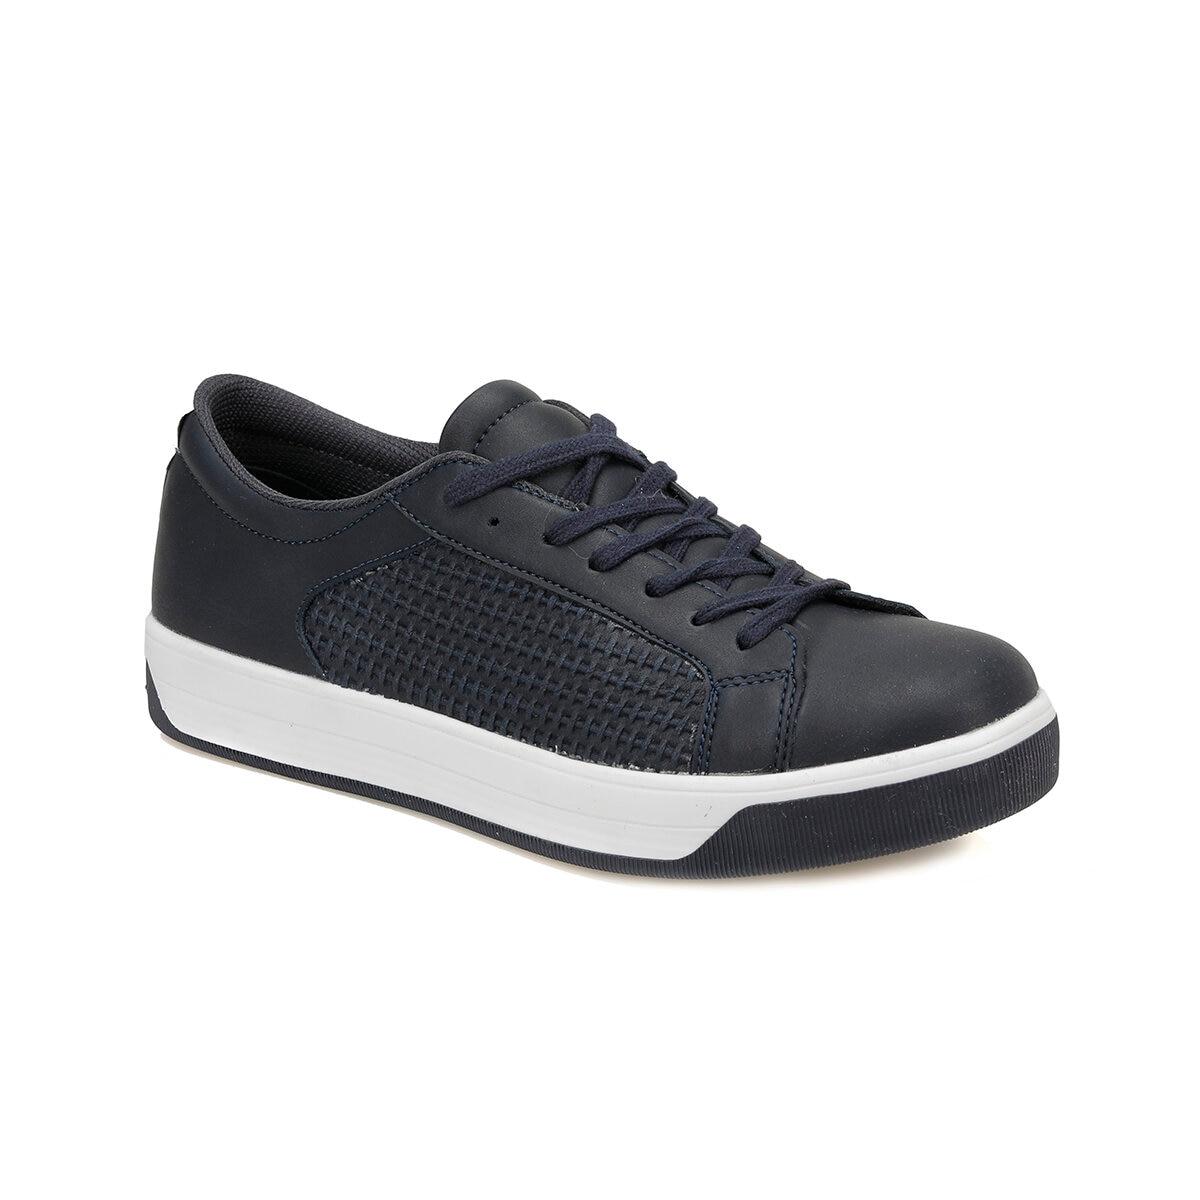 FLO 71175 Navy Blue Men 'S Shoes Forester